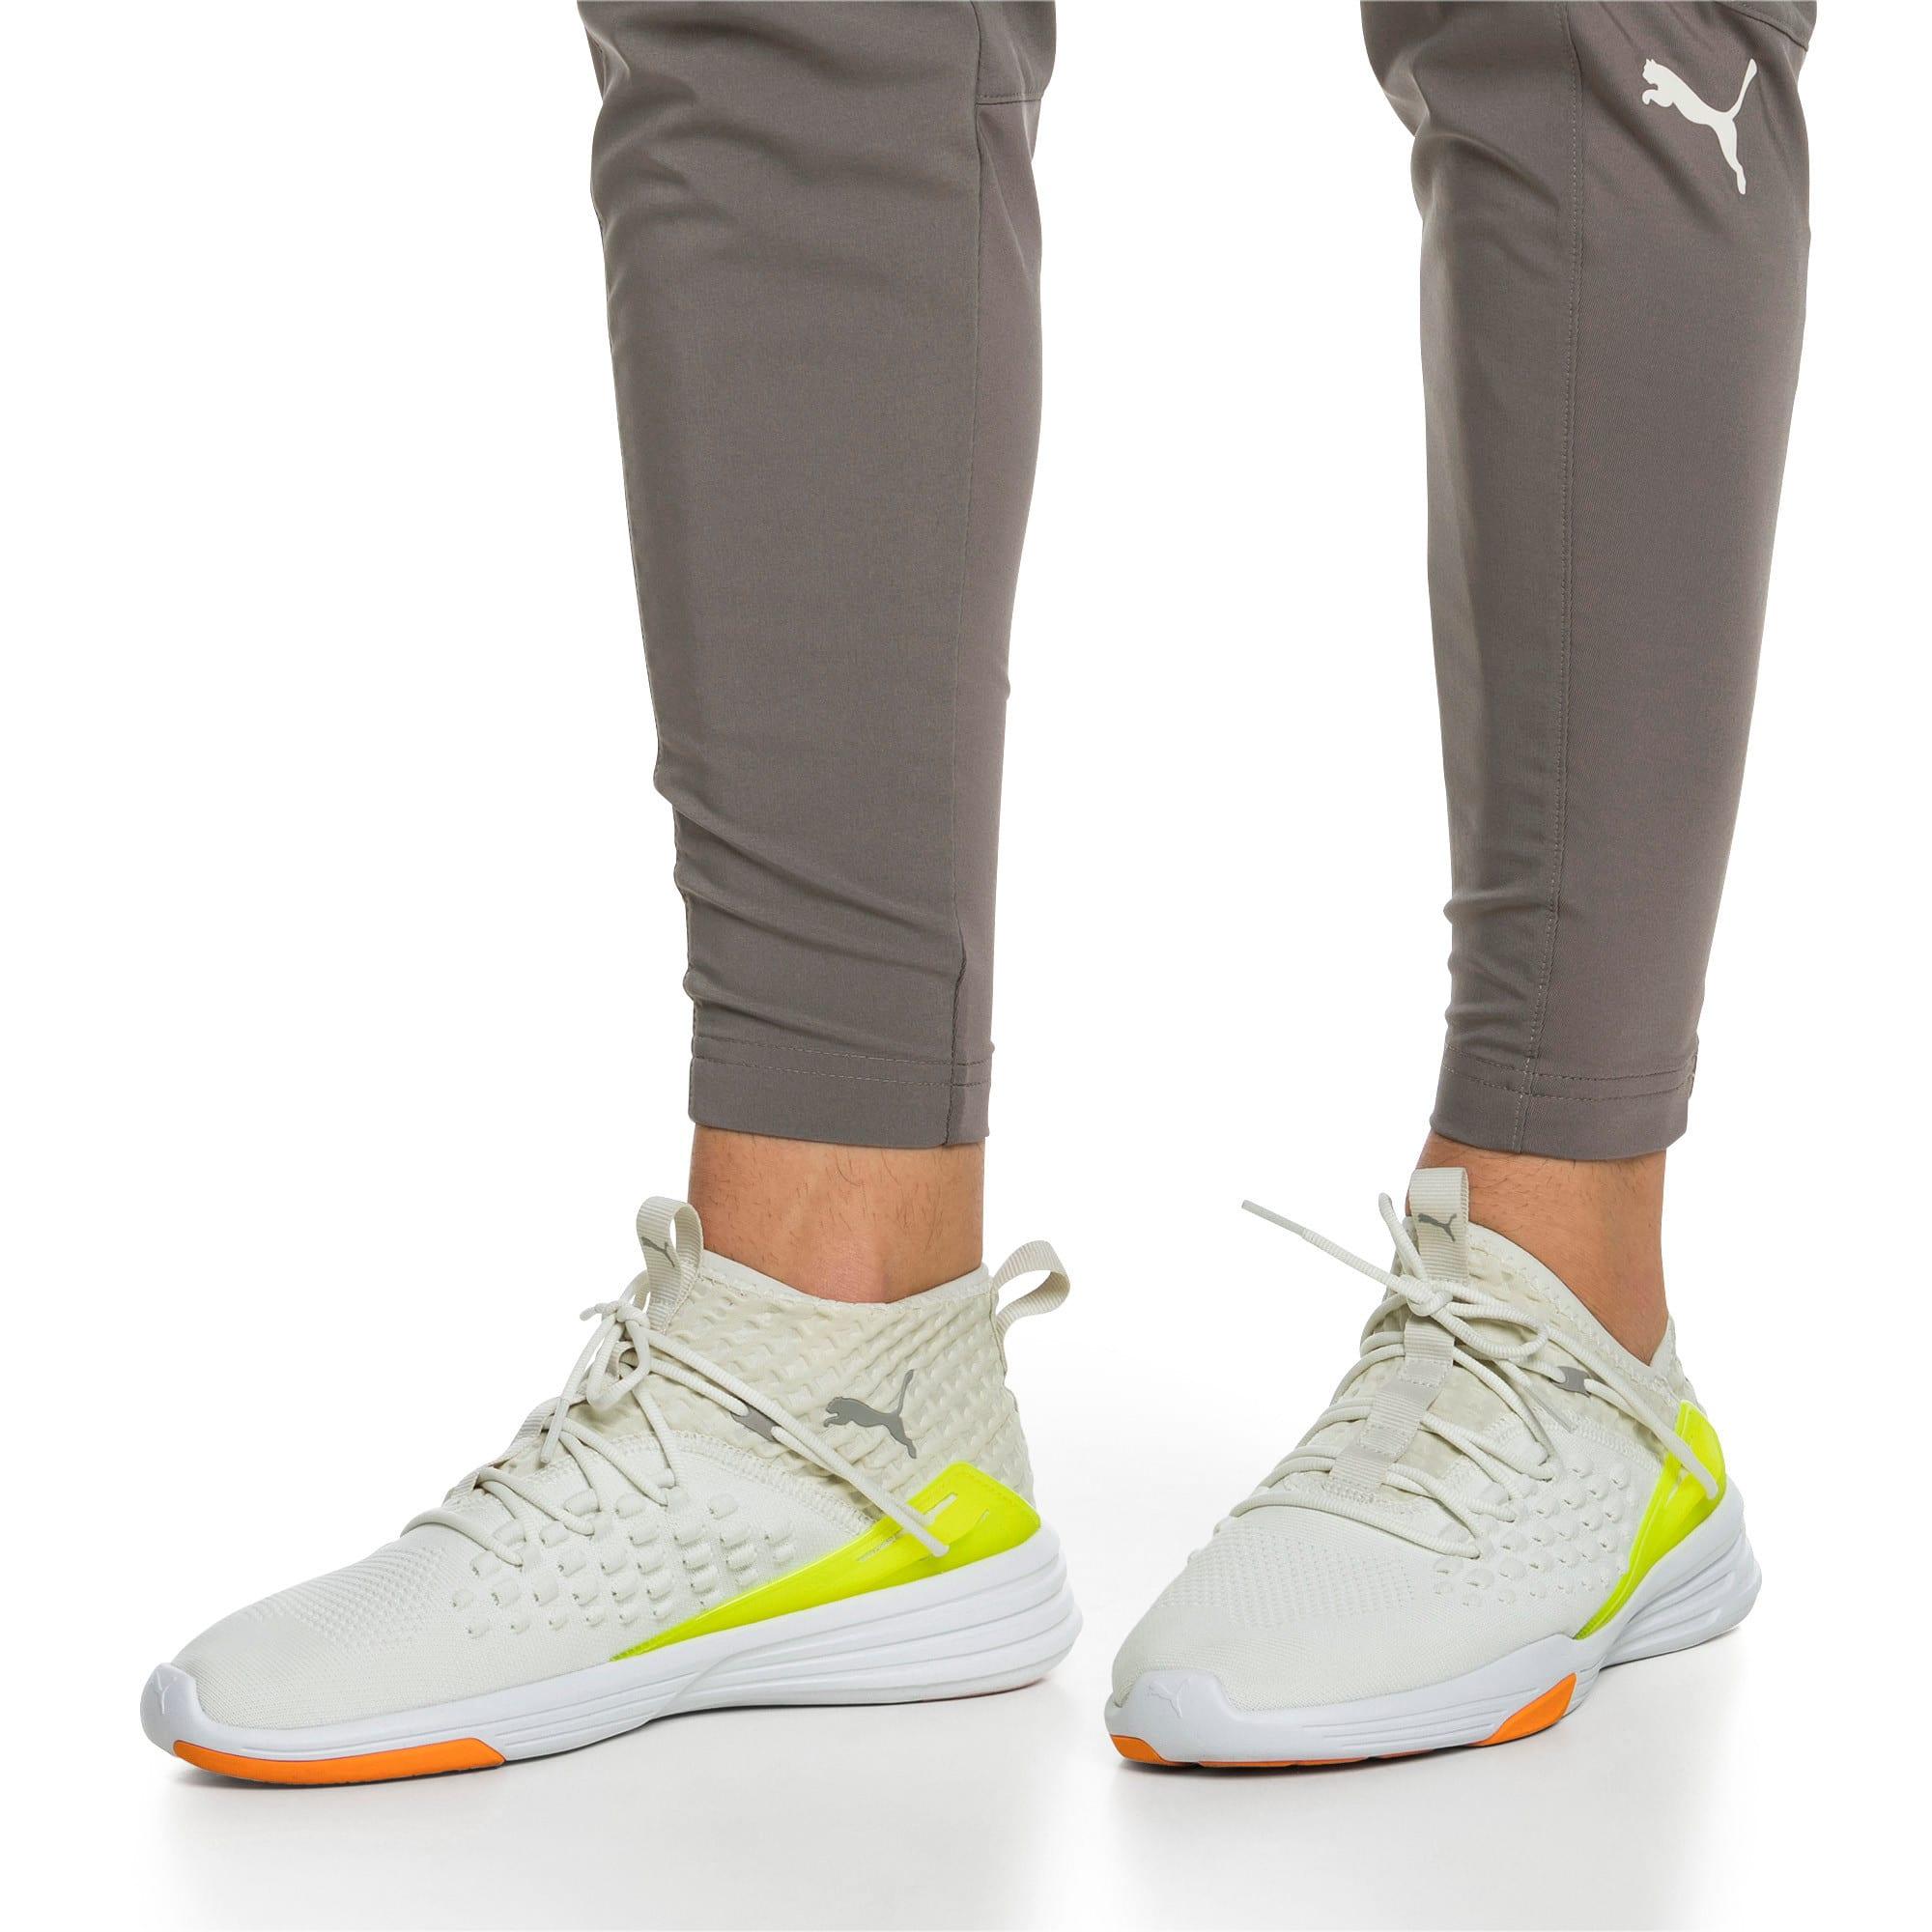 Thumbnail 7 of Mantra Daylight Men's Training Shoes, Vaporous Gray-Puma White, medium